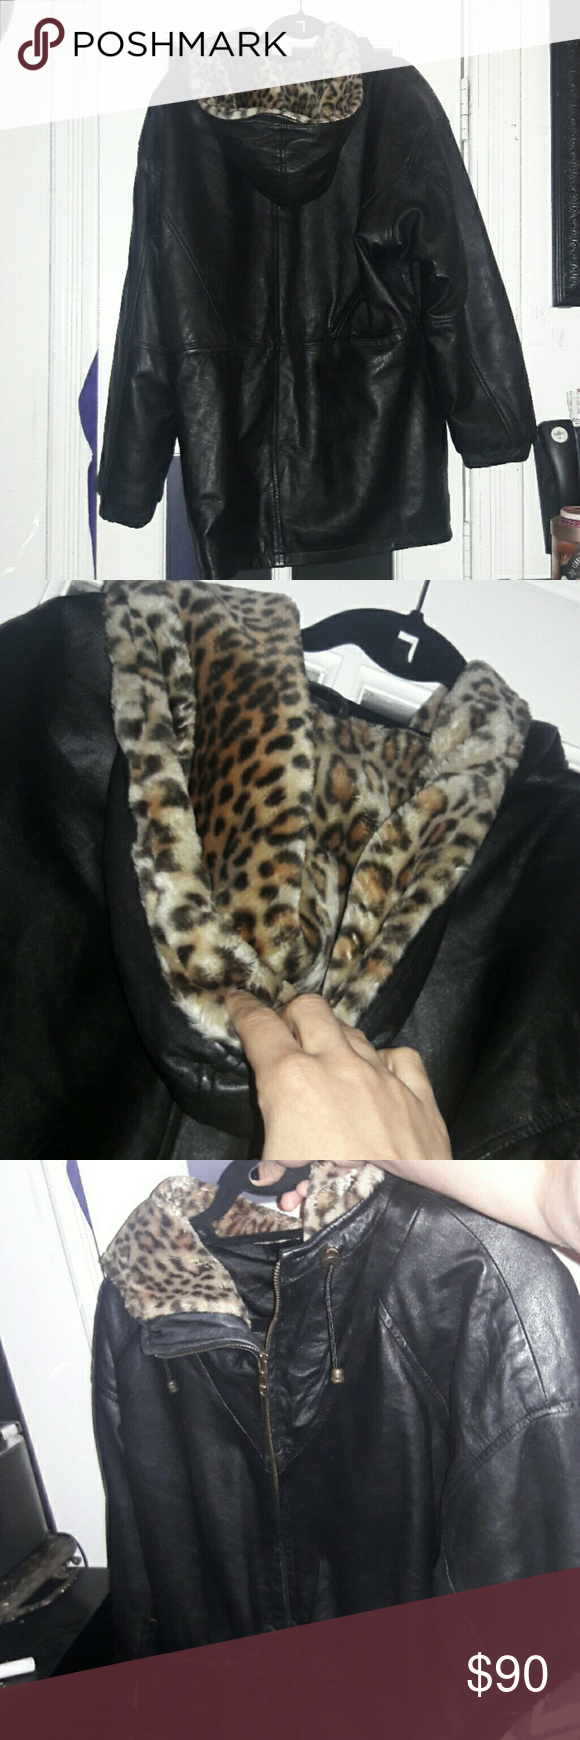 Punk Vintage Leather Cheetah Fur Jacket Fur jacket